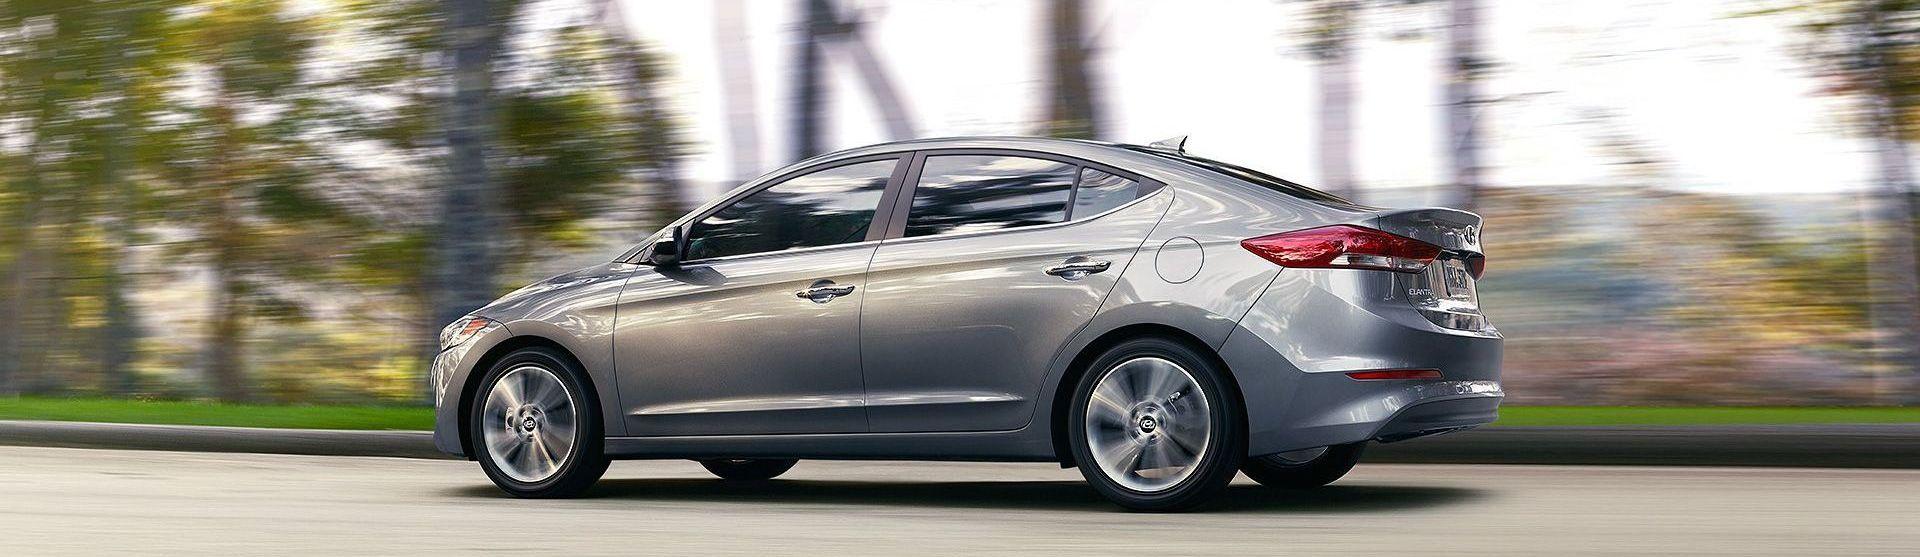 Used Hyundai Elantra for Sale near Manassas, VA